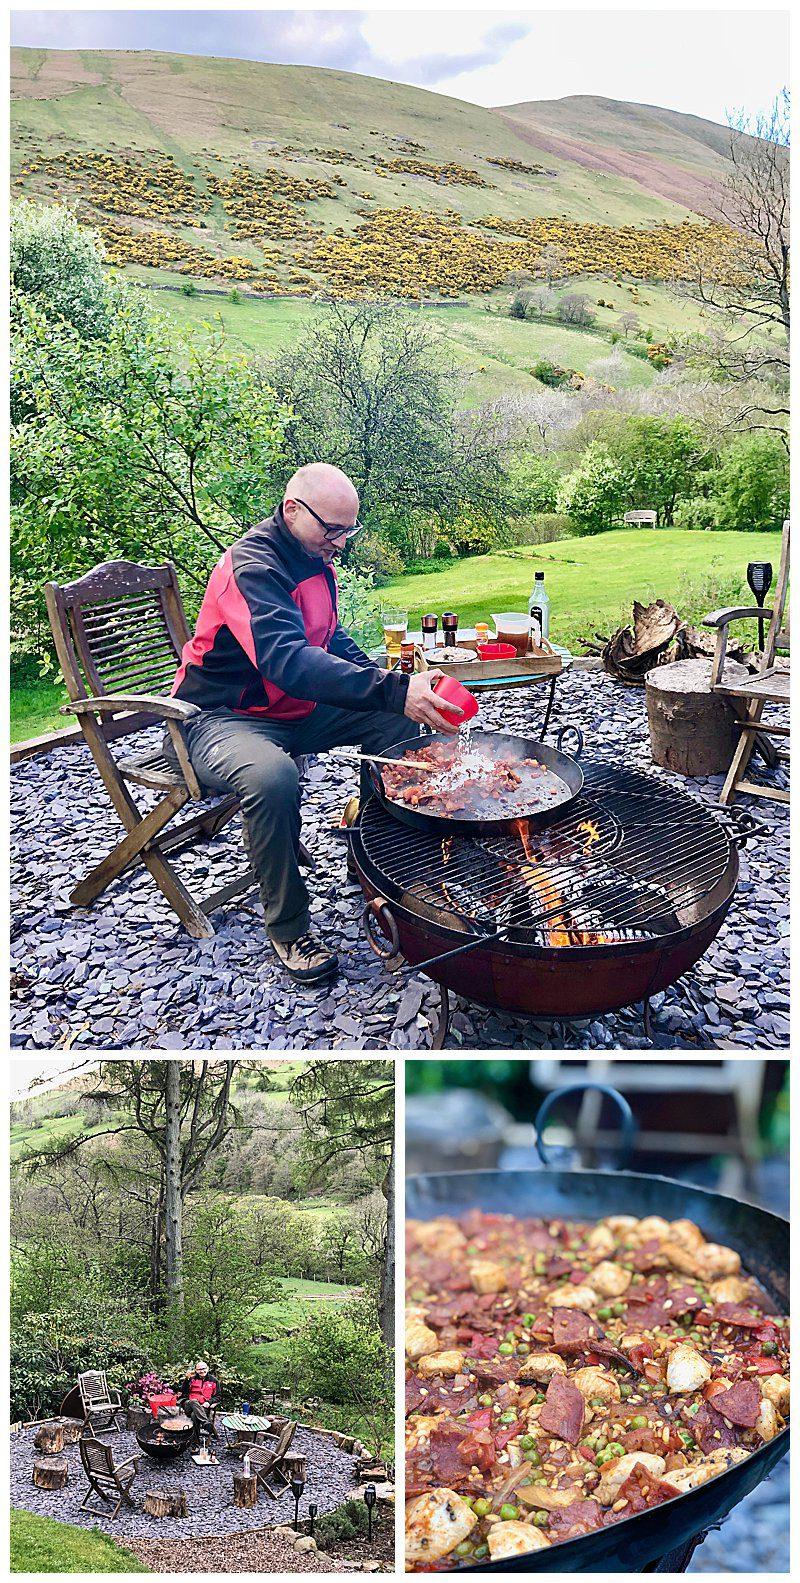 Cooking-Paella-Outdoors.jpg